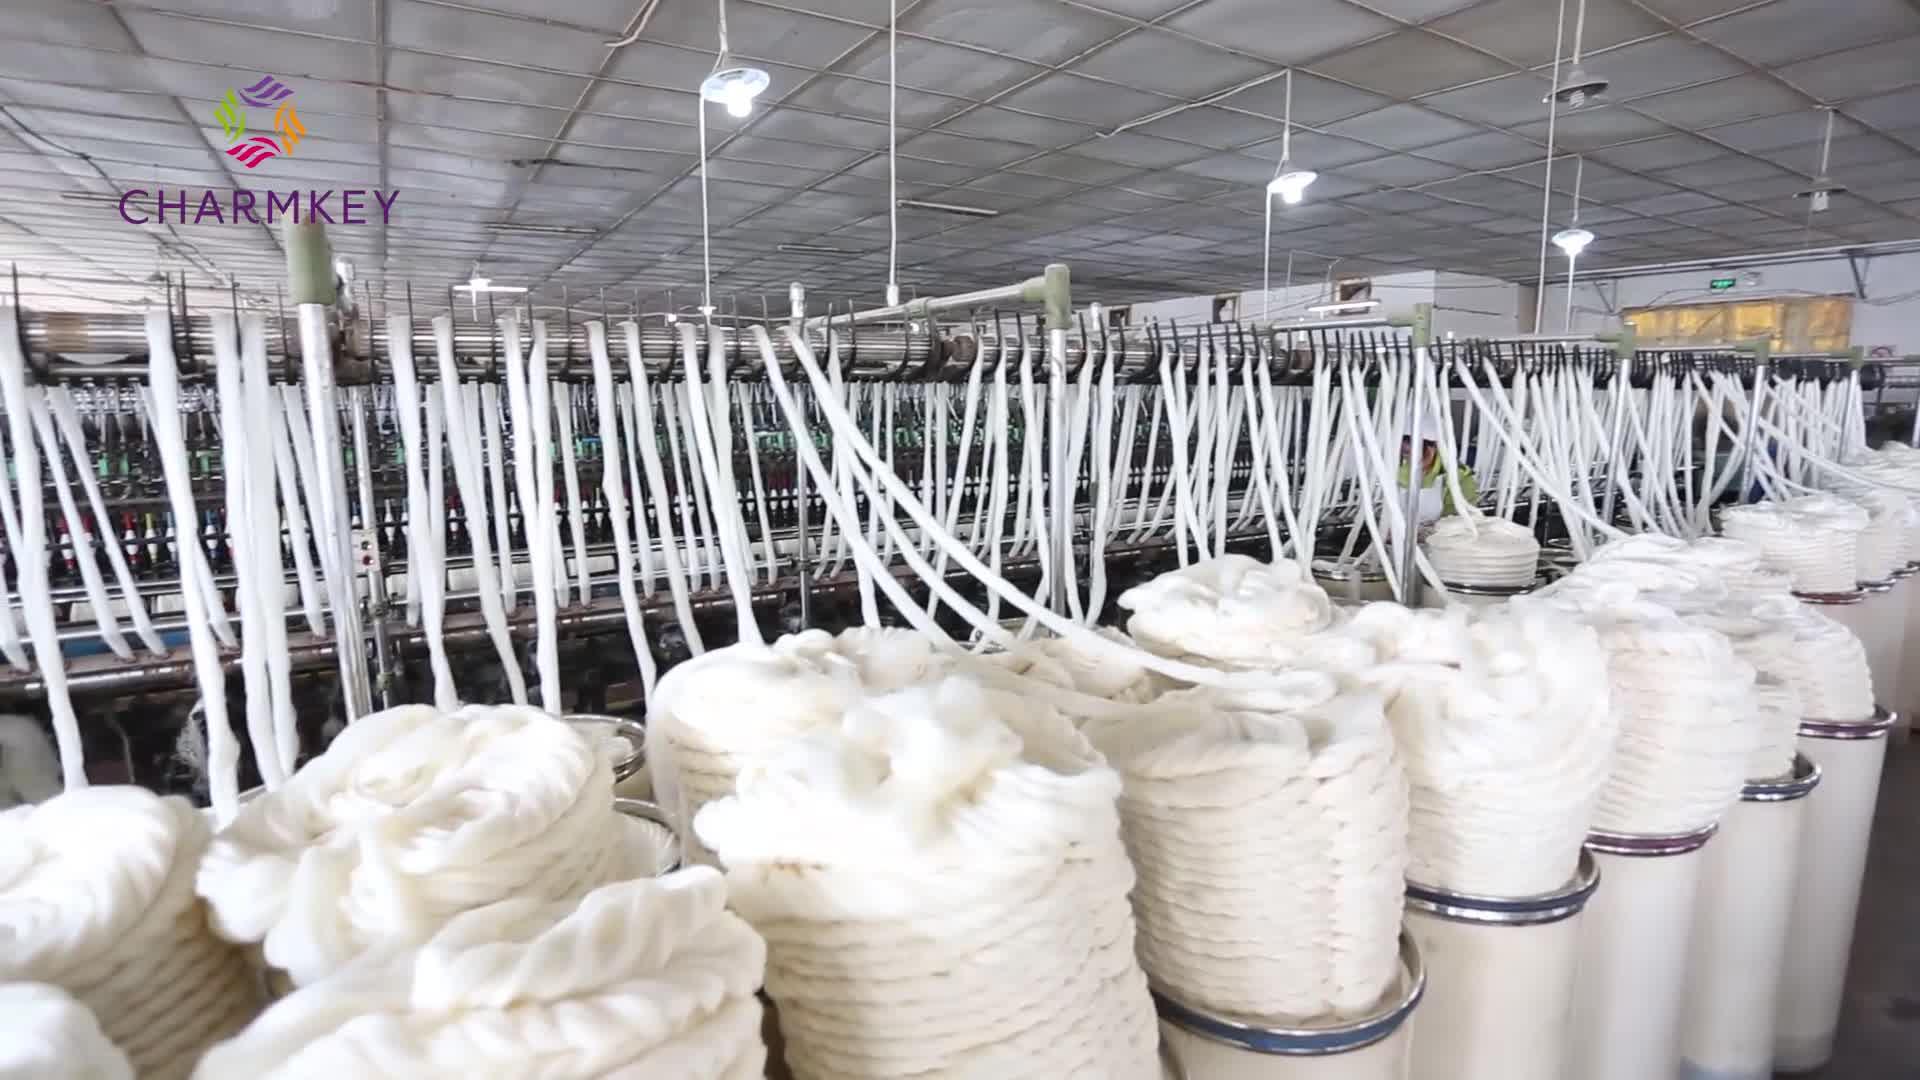 wholesale 9pc/set TPR rubber needle aluminum crochet hook set knitting needle for knitting